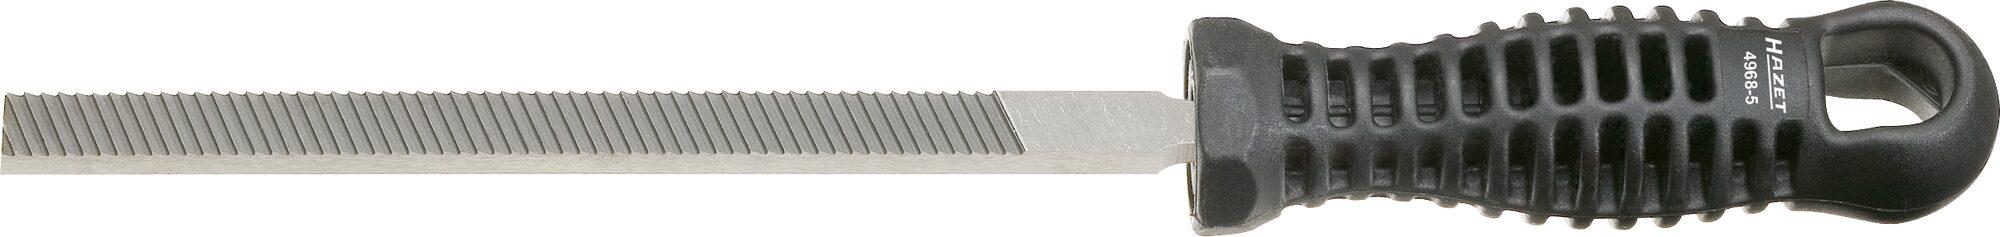 HAZET Bremssattel-Feile 4968-5 ∙ 265 mm